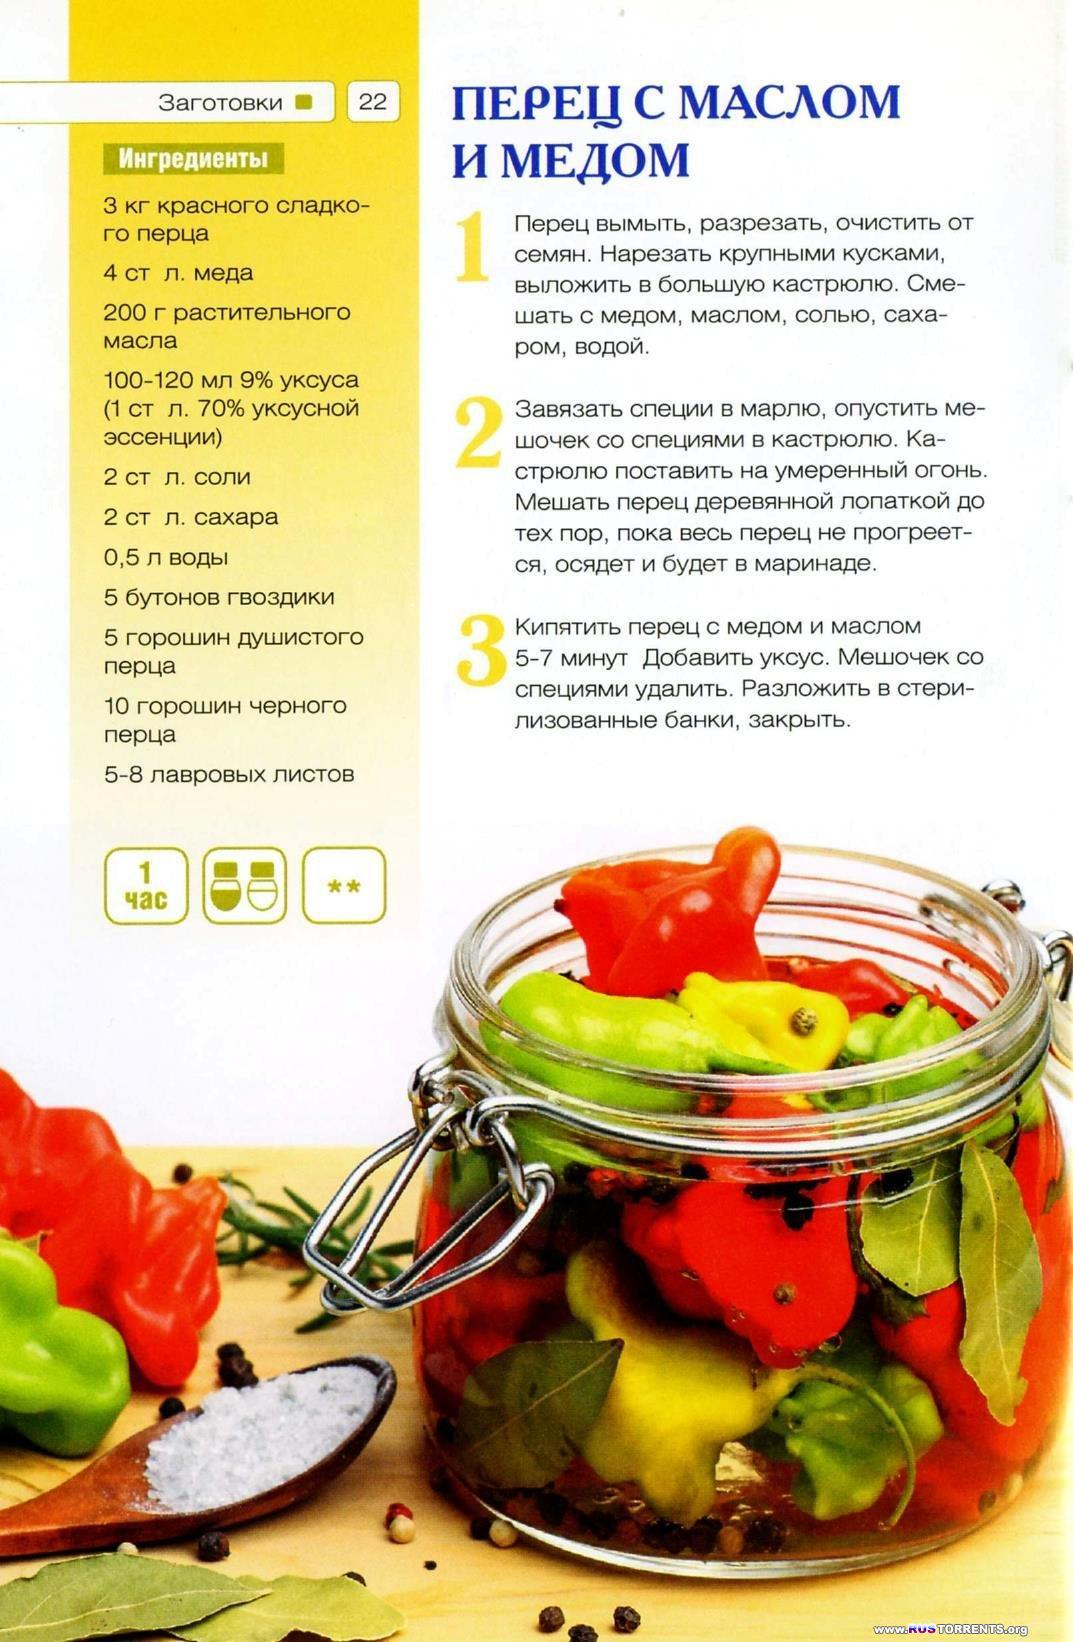 Заготовки из перца | PDF